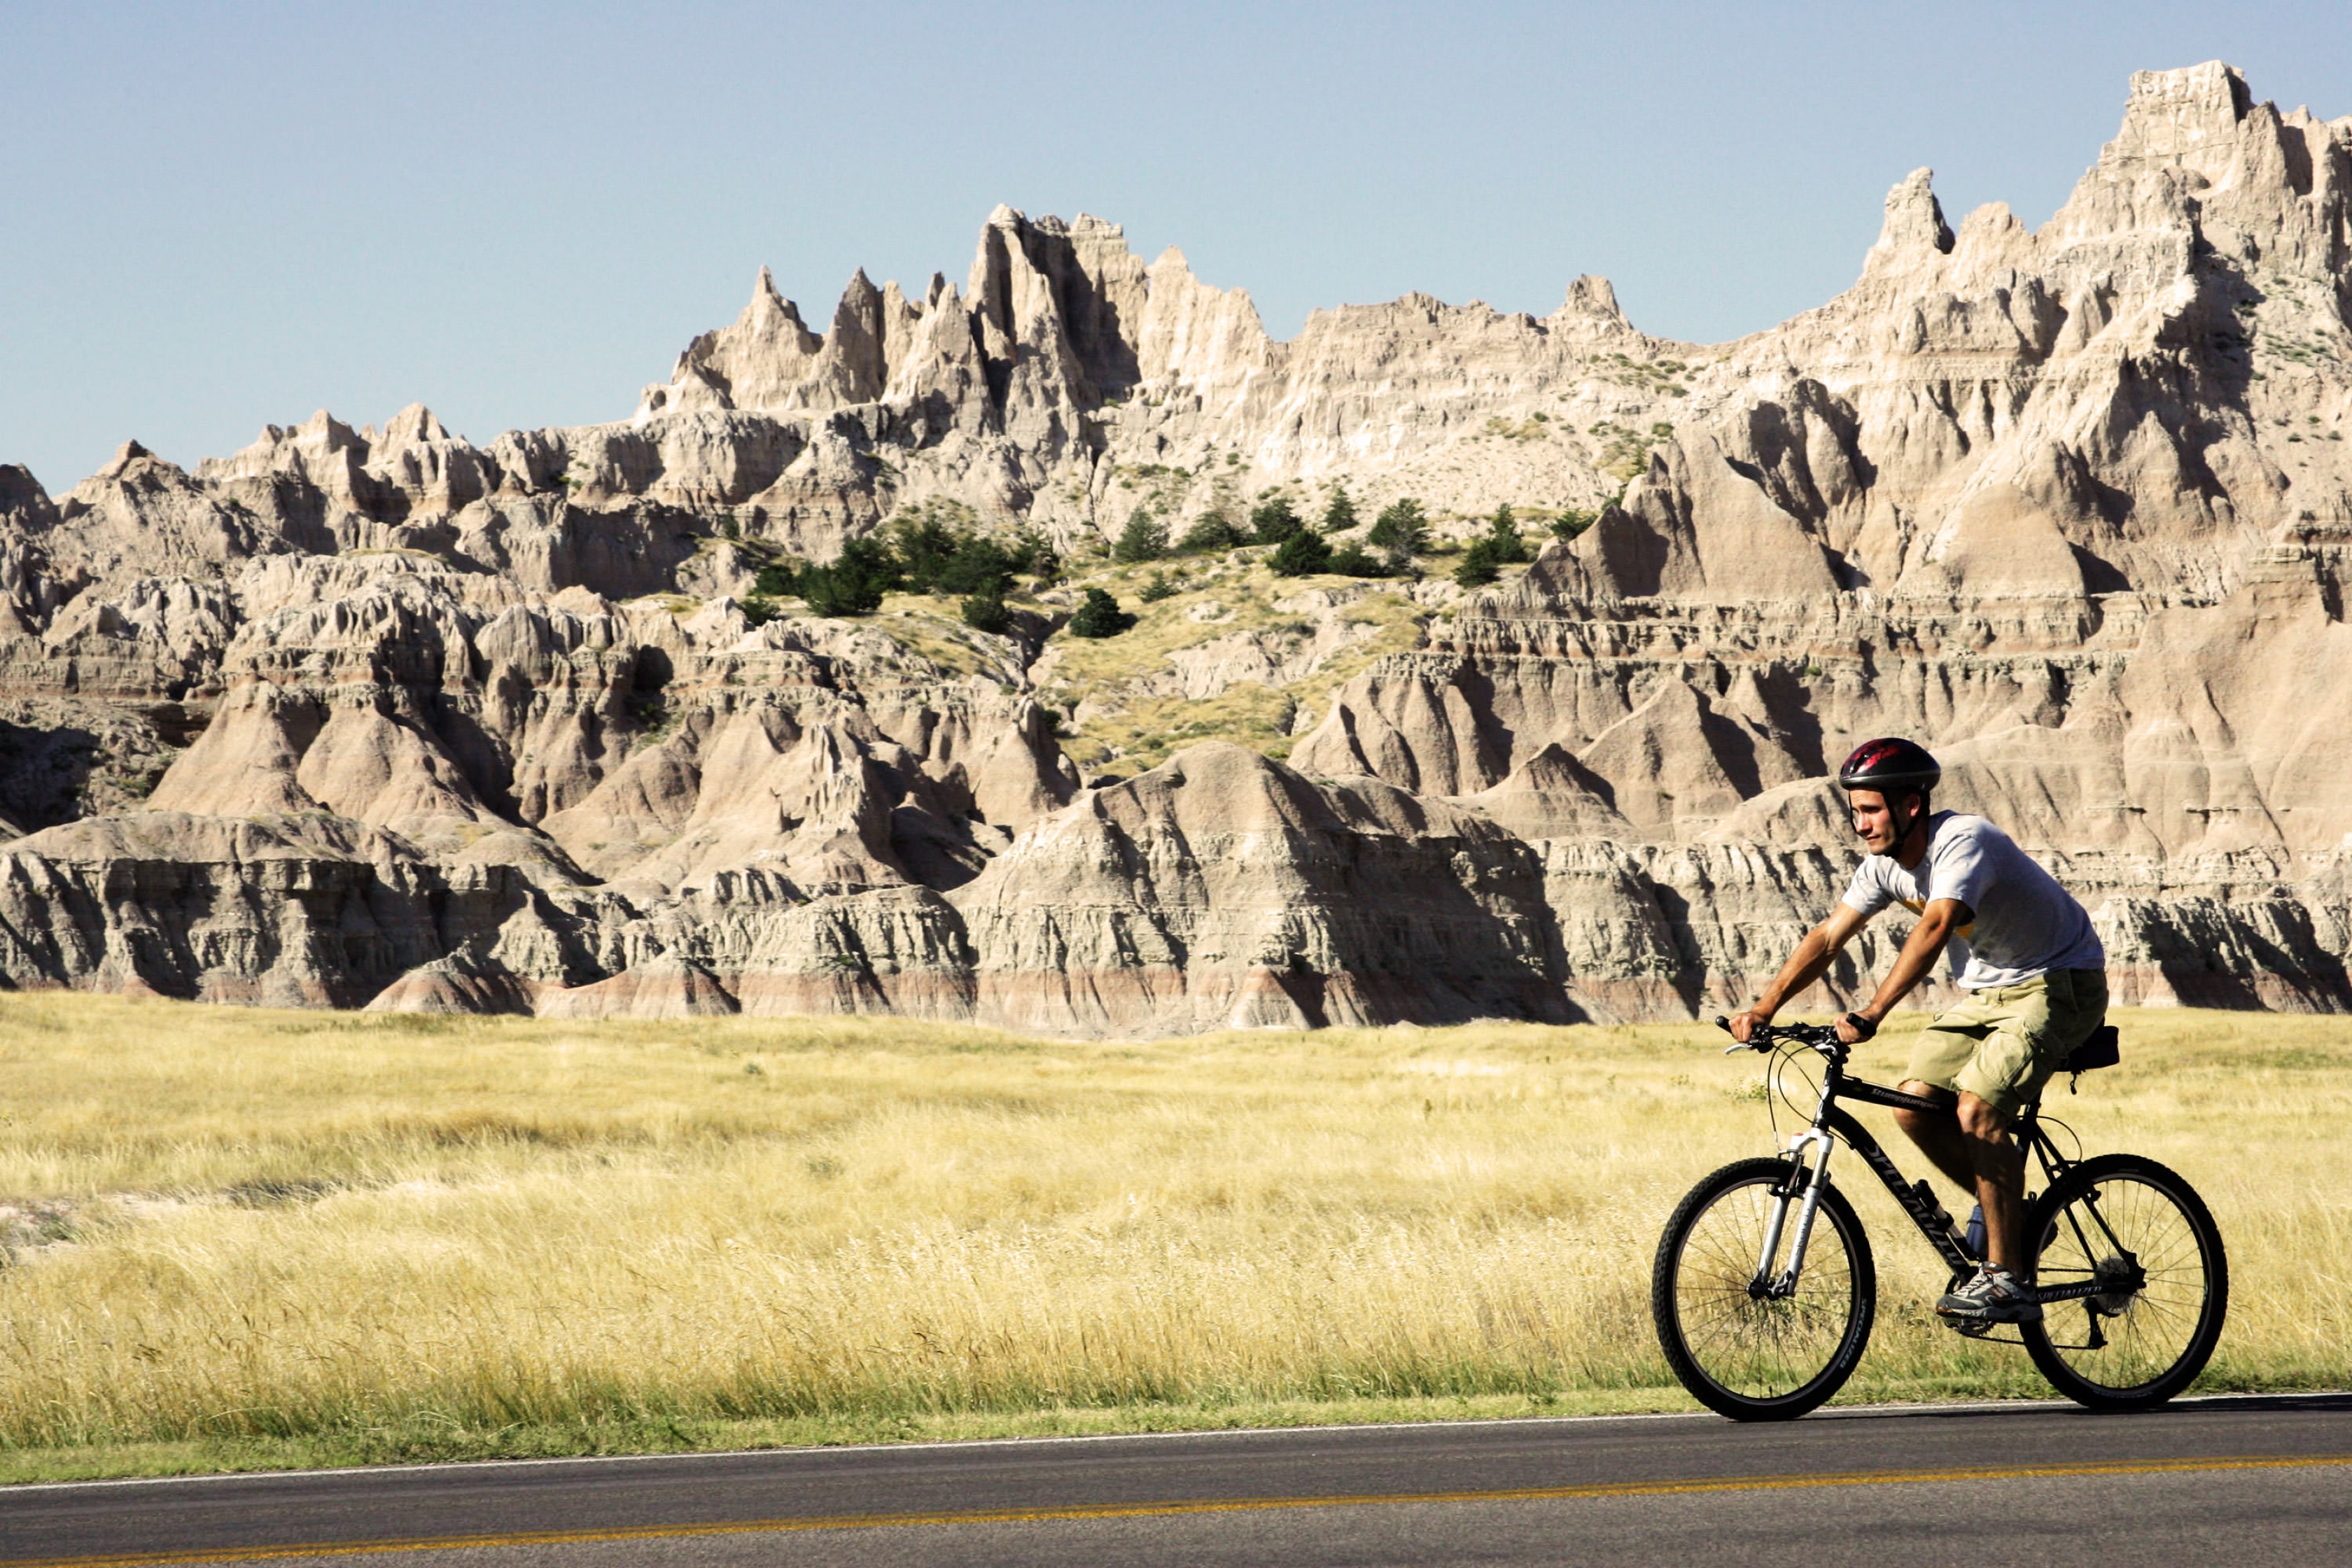 A man bikes through Badlands National Park.